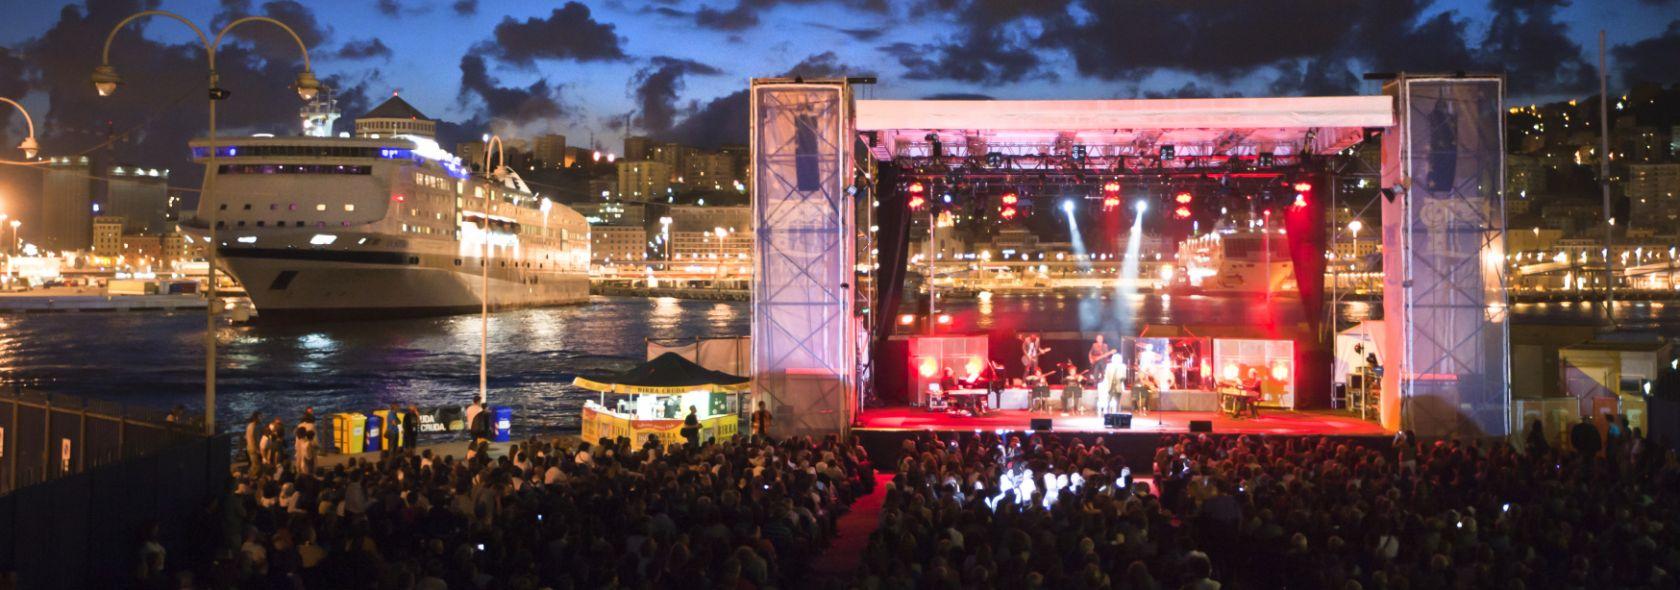 Un concerto al Porto Antico